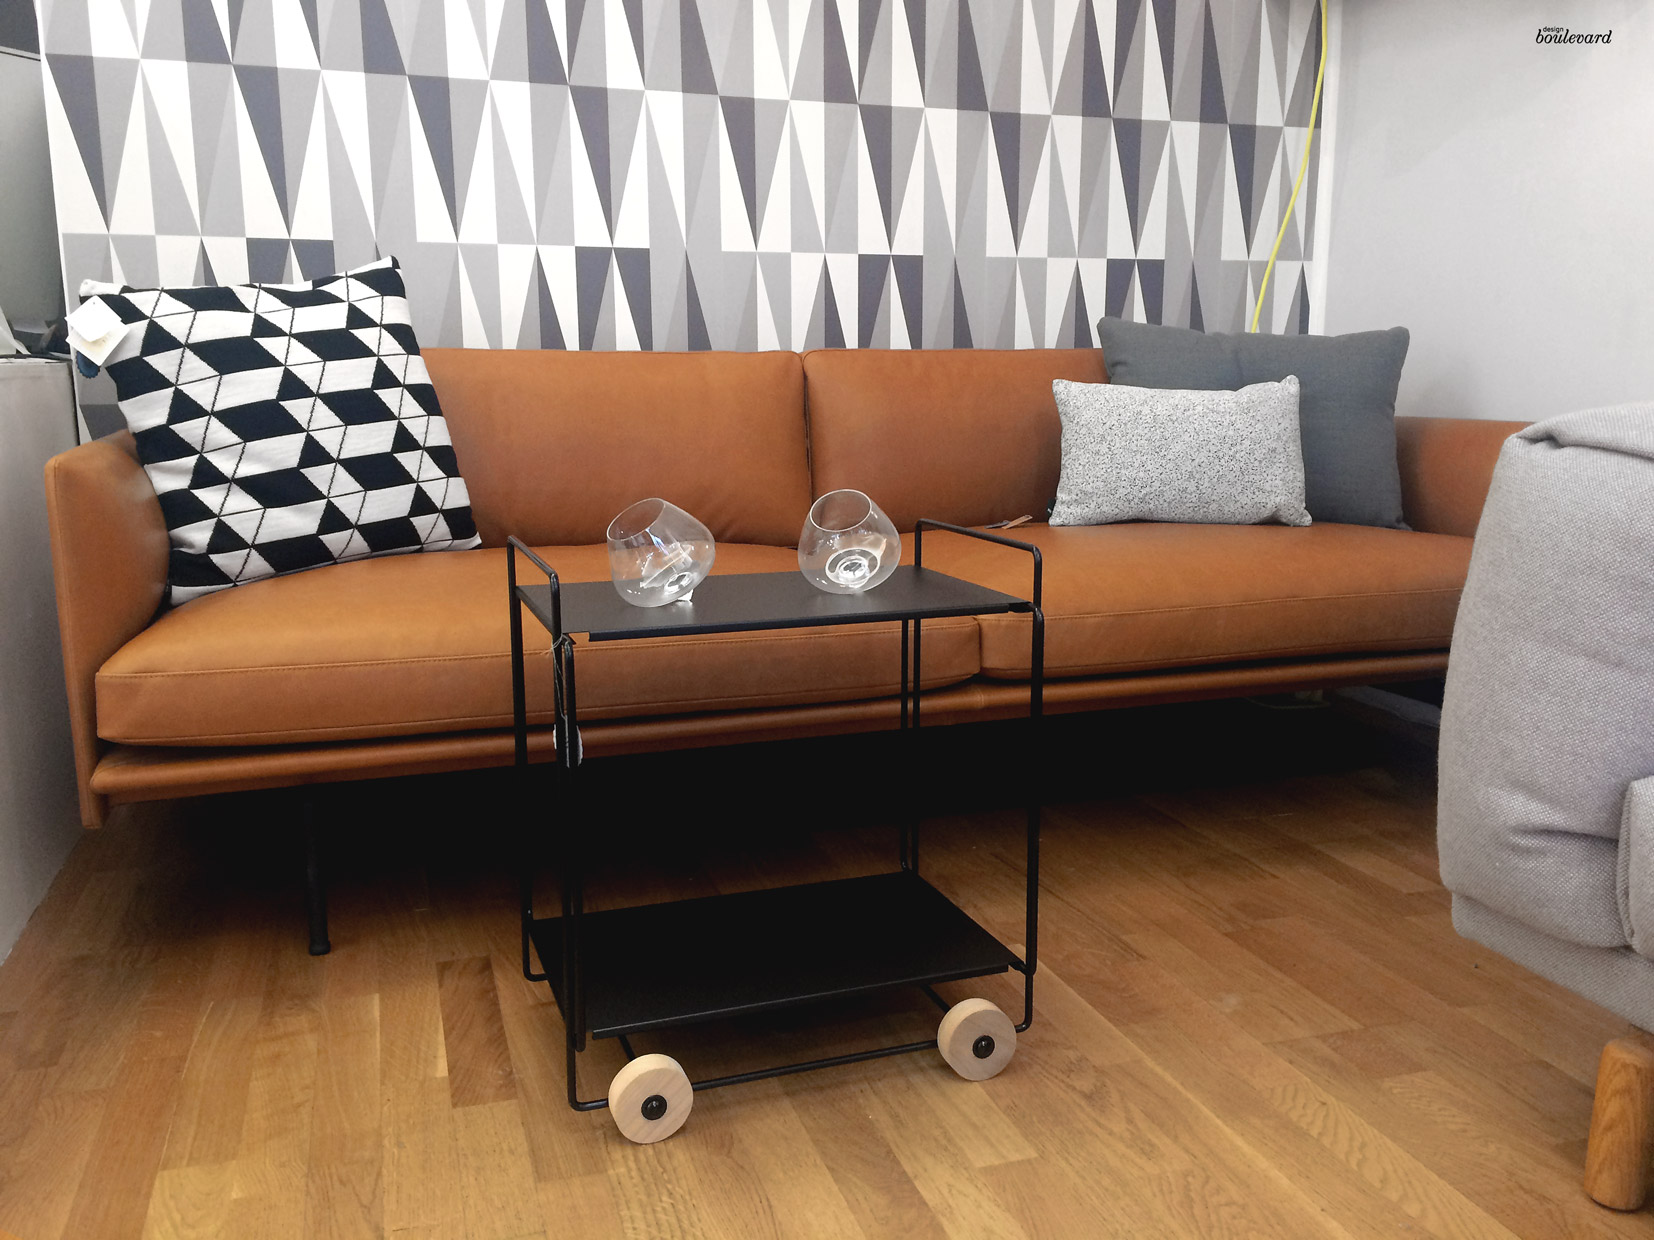 Outline sohva ja Tampere kärry Design Boulevardilla.